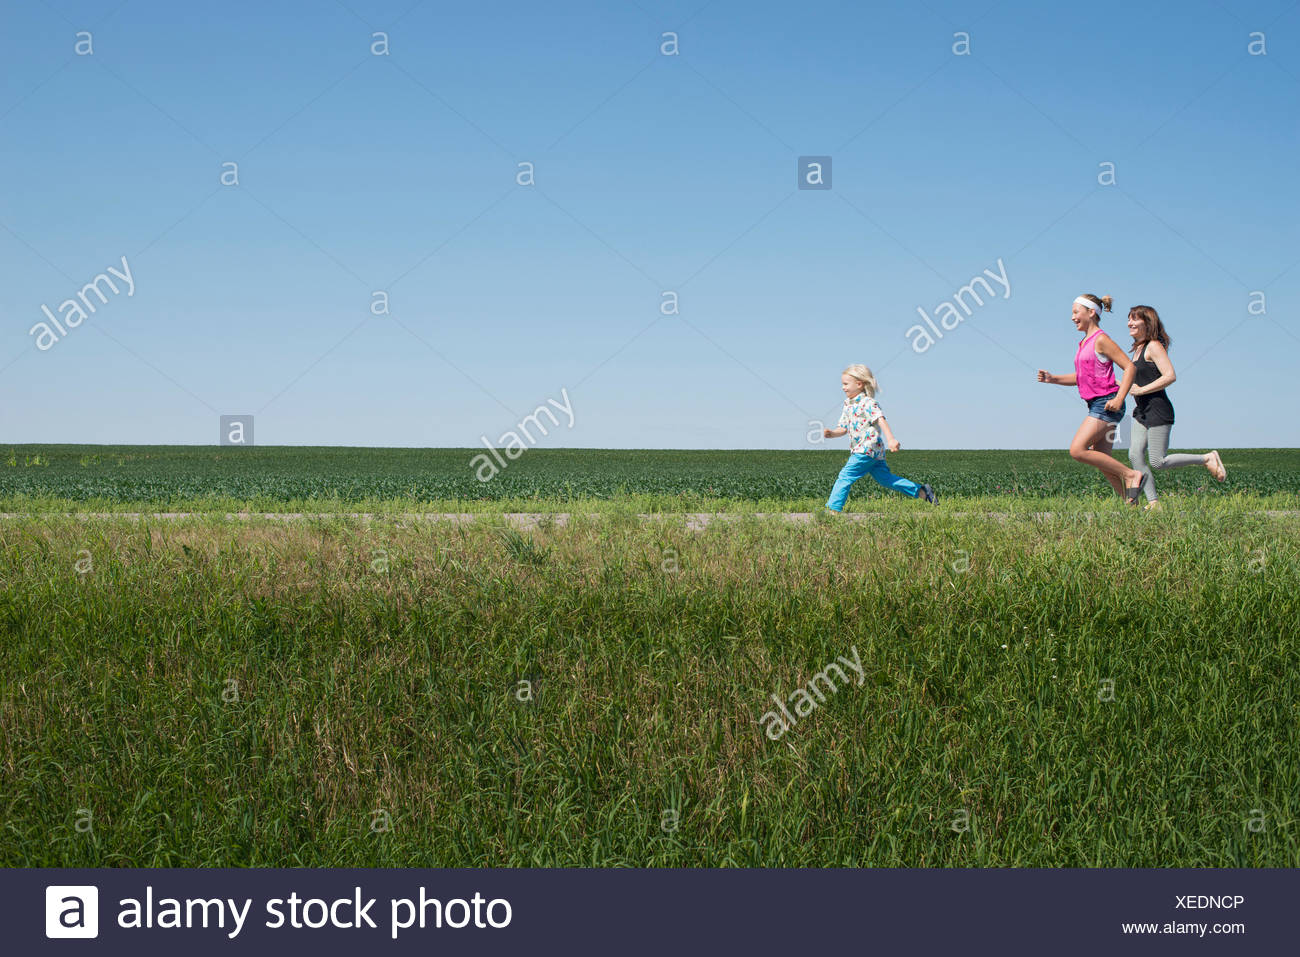 Three people running through field - Stock Image